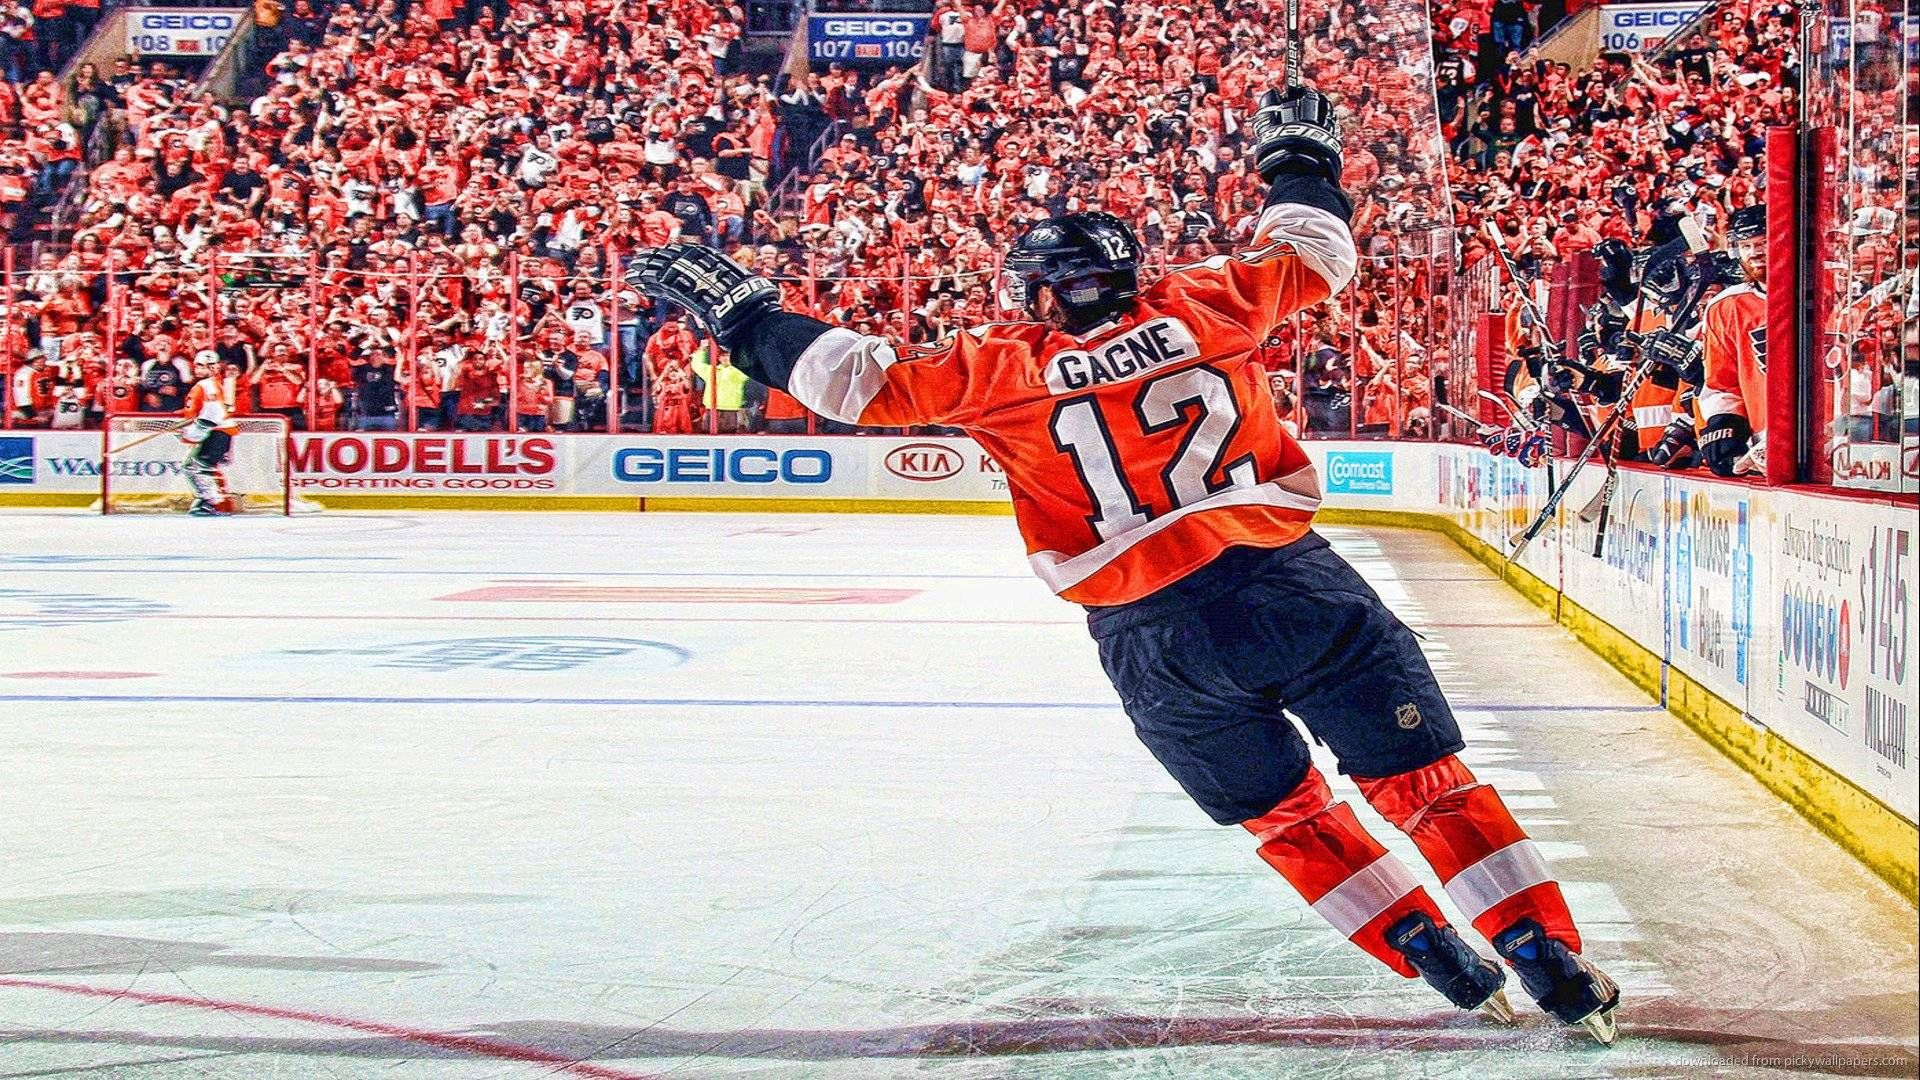 Hockey Hd Wallpapers Sport Backgrounds 1280 960 Hockey Wallpapers 44 Wallpapers Adorable Wallpapers